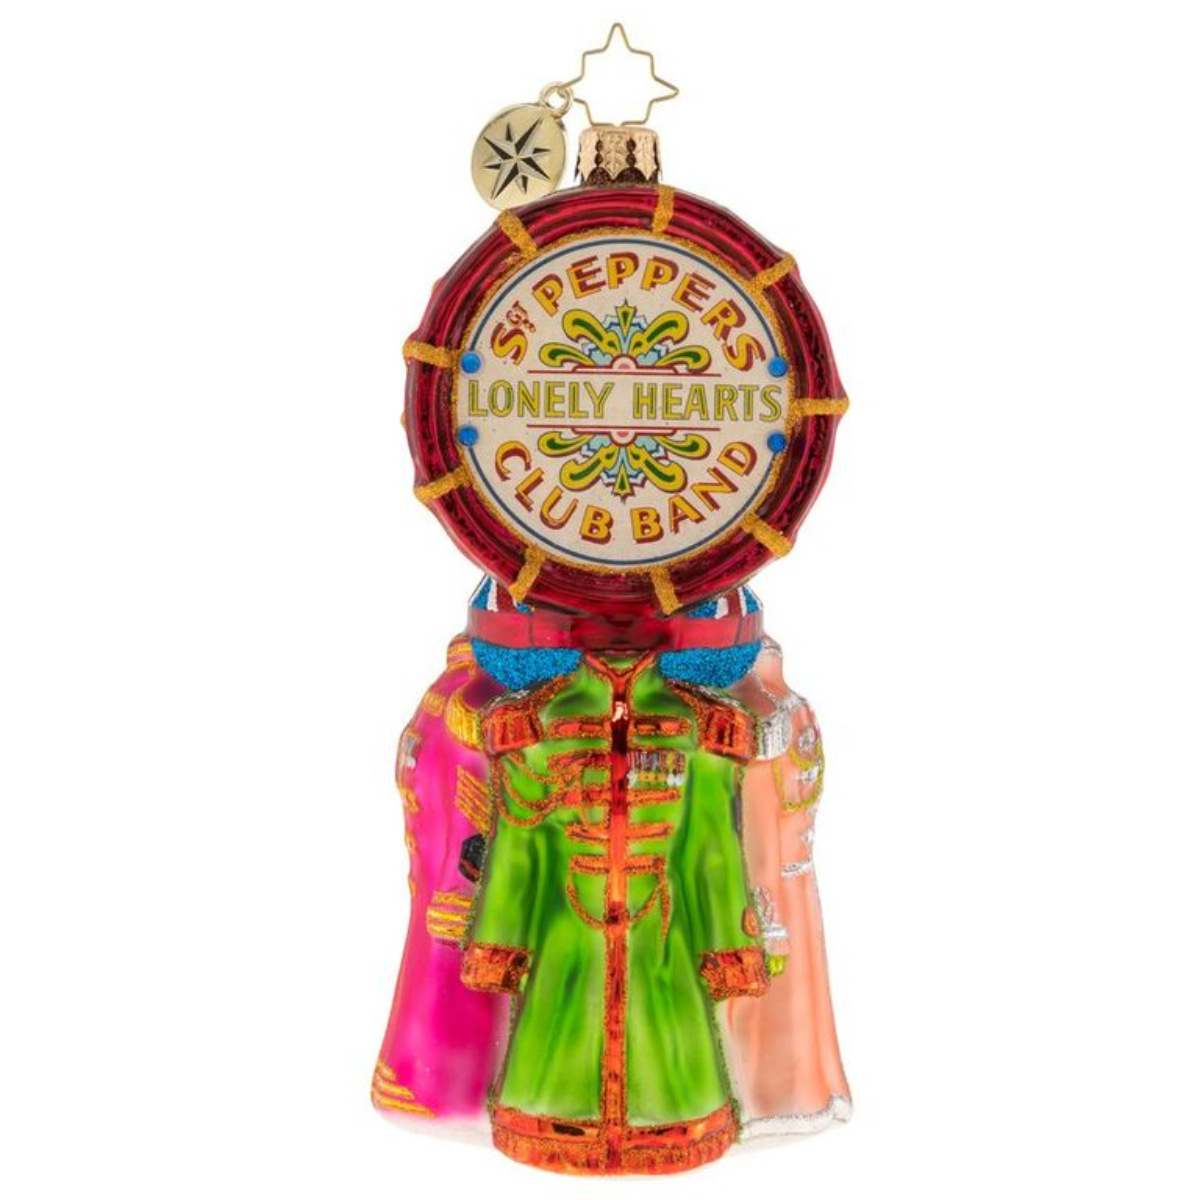 Sgt. Pepper's Band Ornament